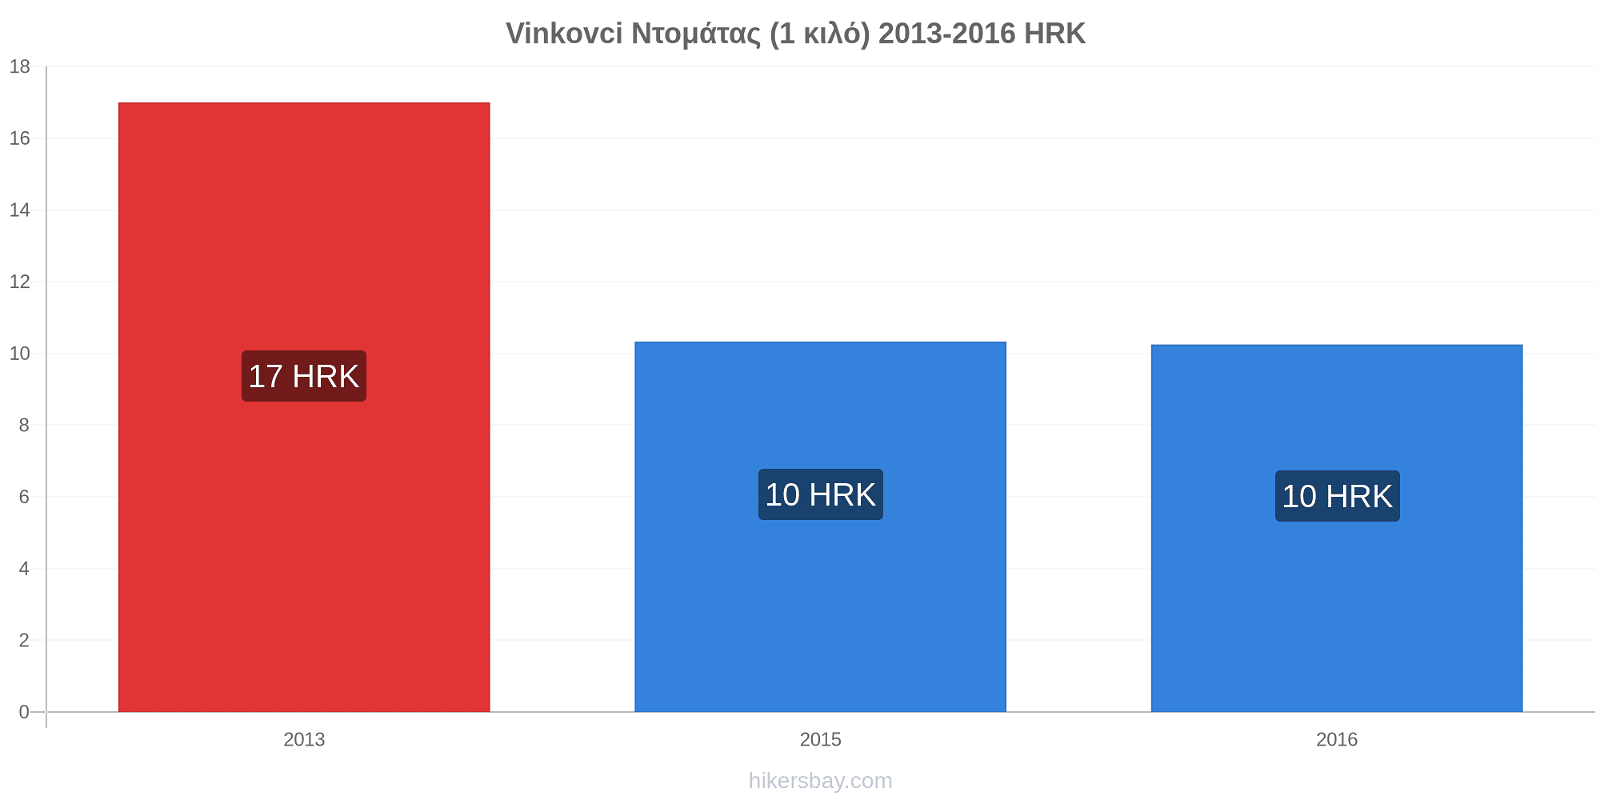 Vinkovci αλλαγές τιμών Ντομάτας (1 κιλό) hikersbay.com